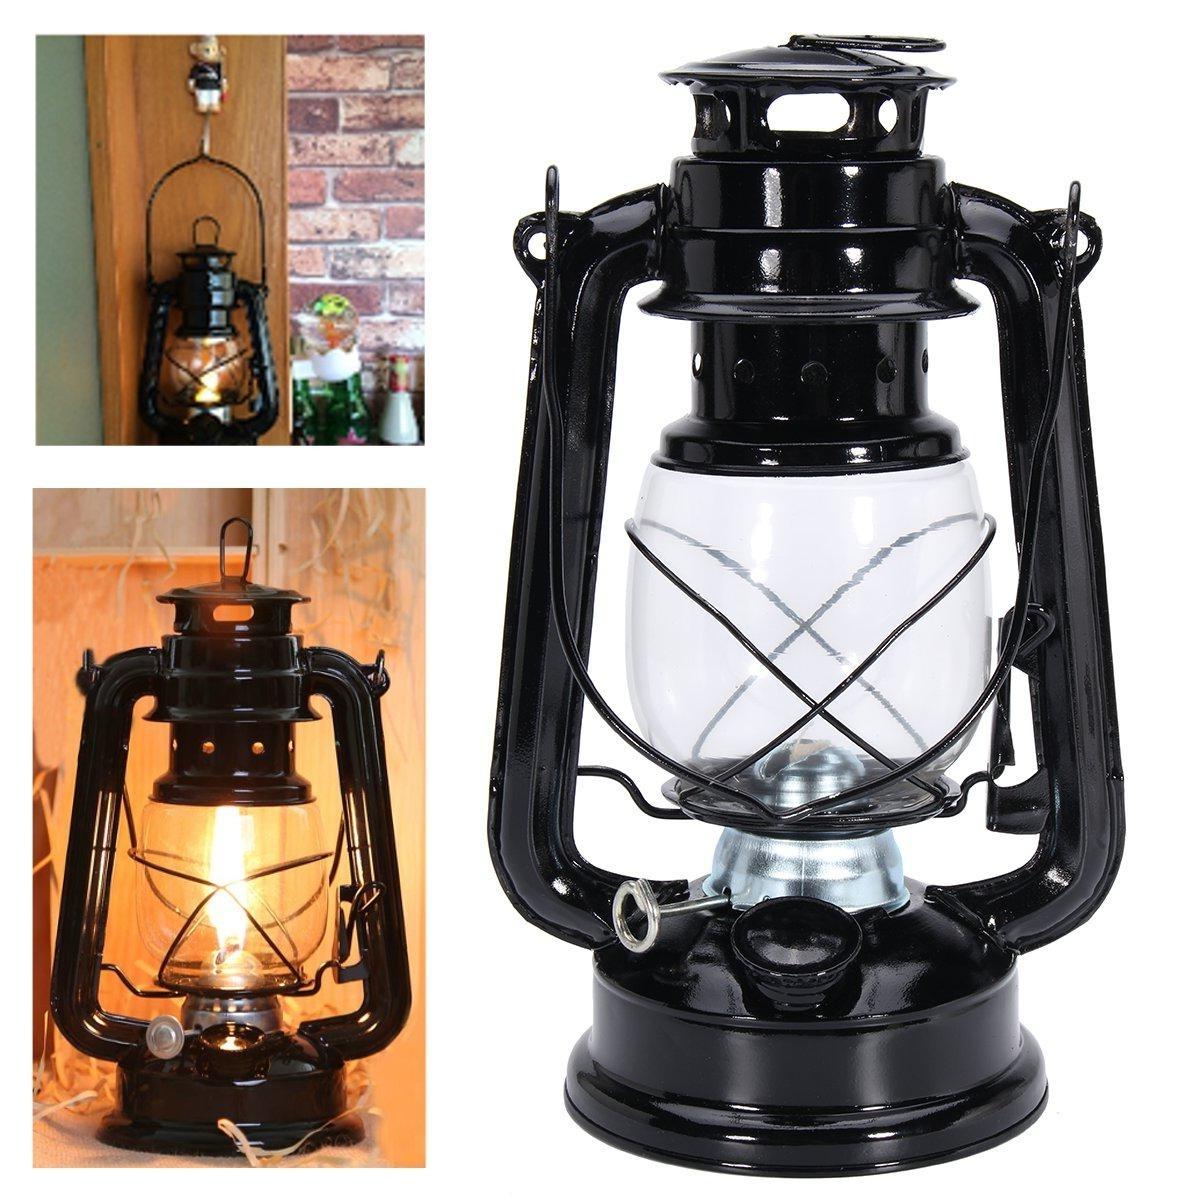 Decorative Outdoor Kerosene Lanterns Regarding Most Recently Released Ipree® Retro Oil Lantern Outdoor Garden Camp Kerosene Paraffin (Gallery 7 of 20)